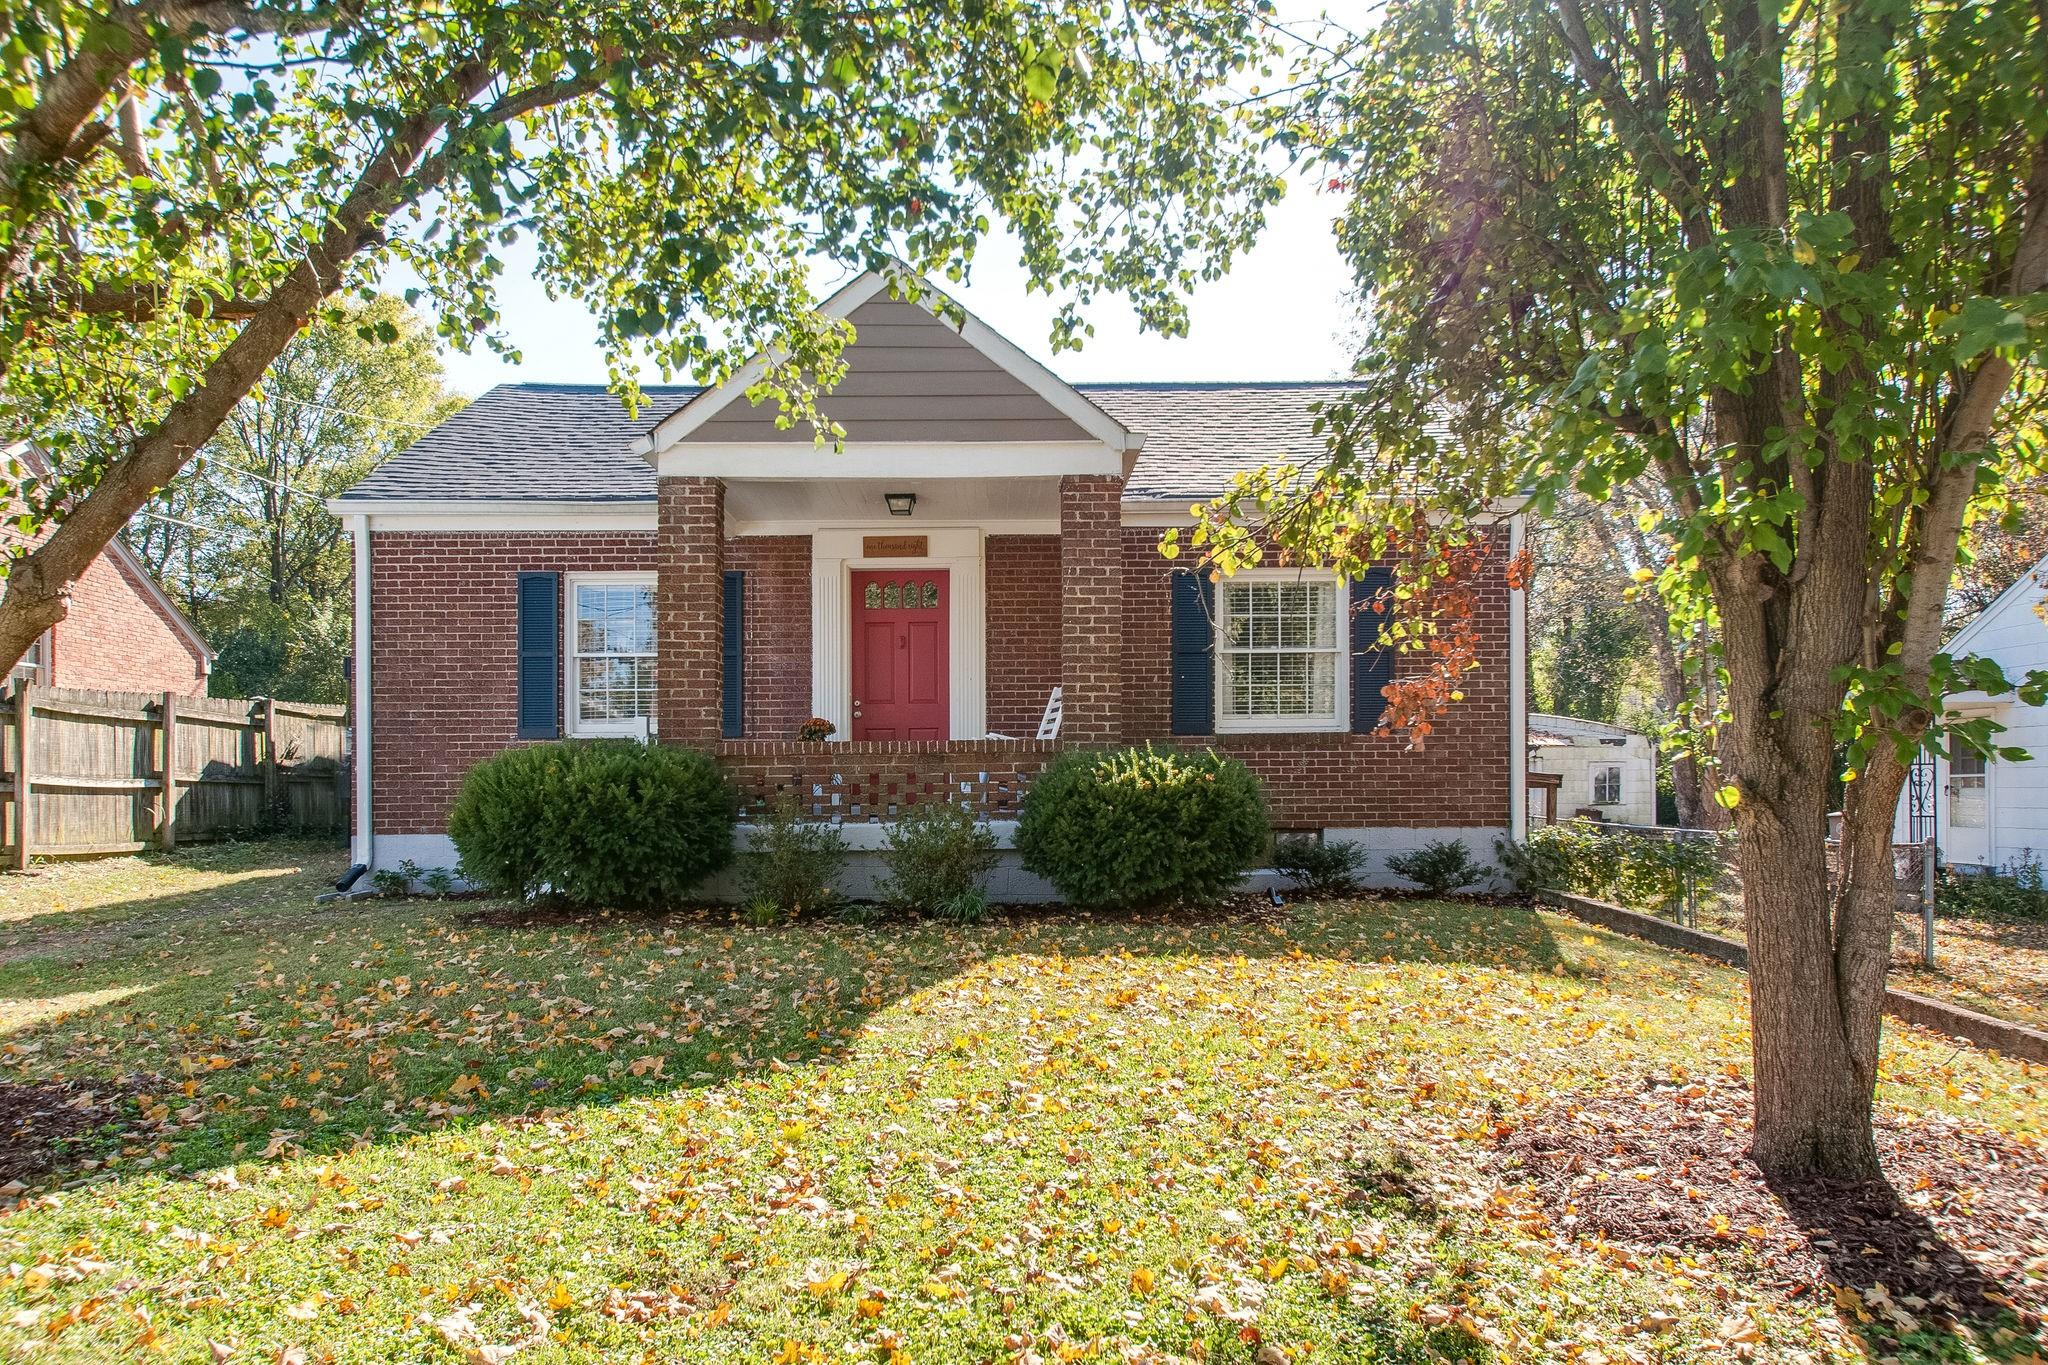 1008 Malquin Dr, Nashville, TN 37216 - Nashville, TN real estate listing